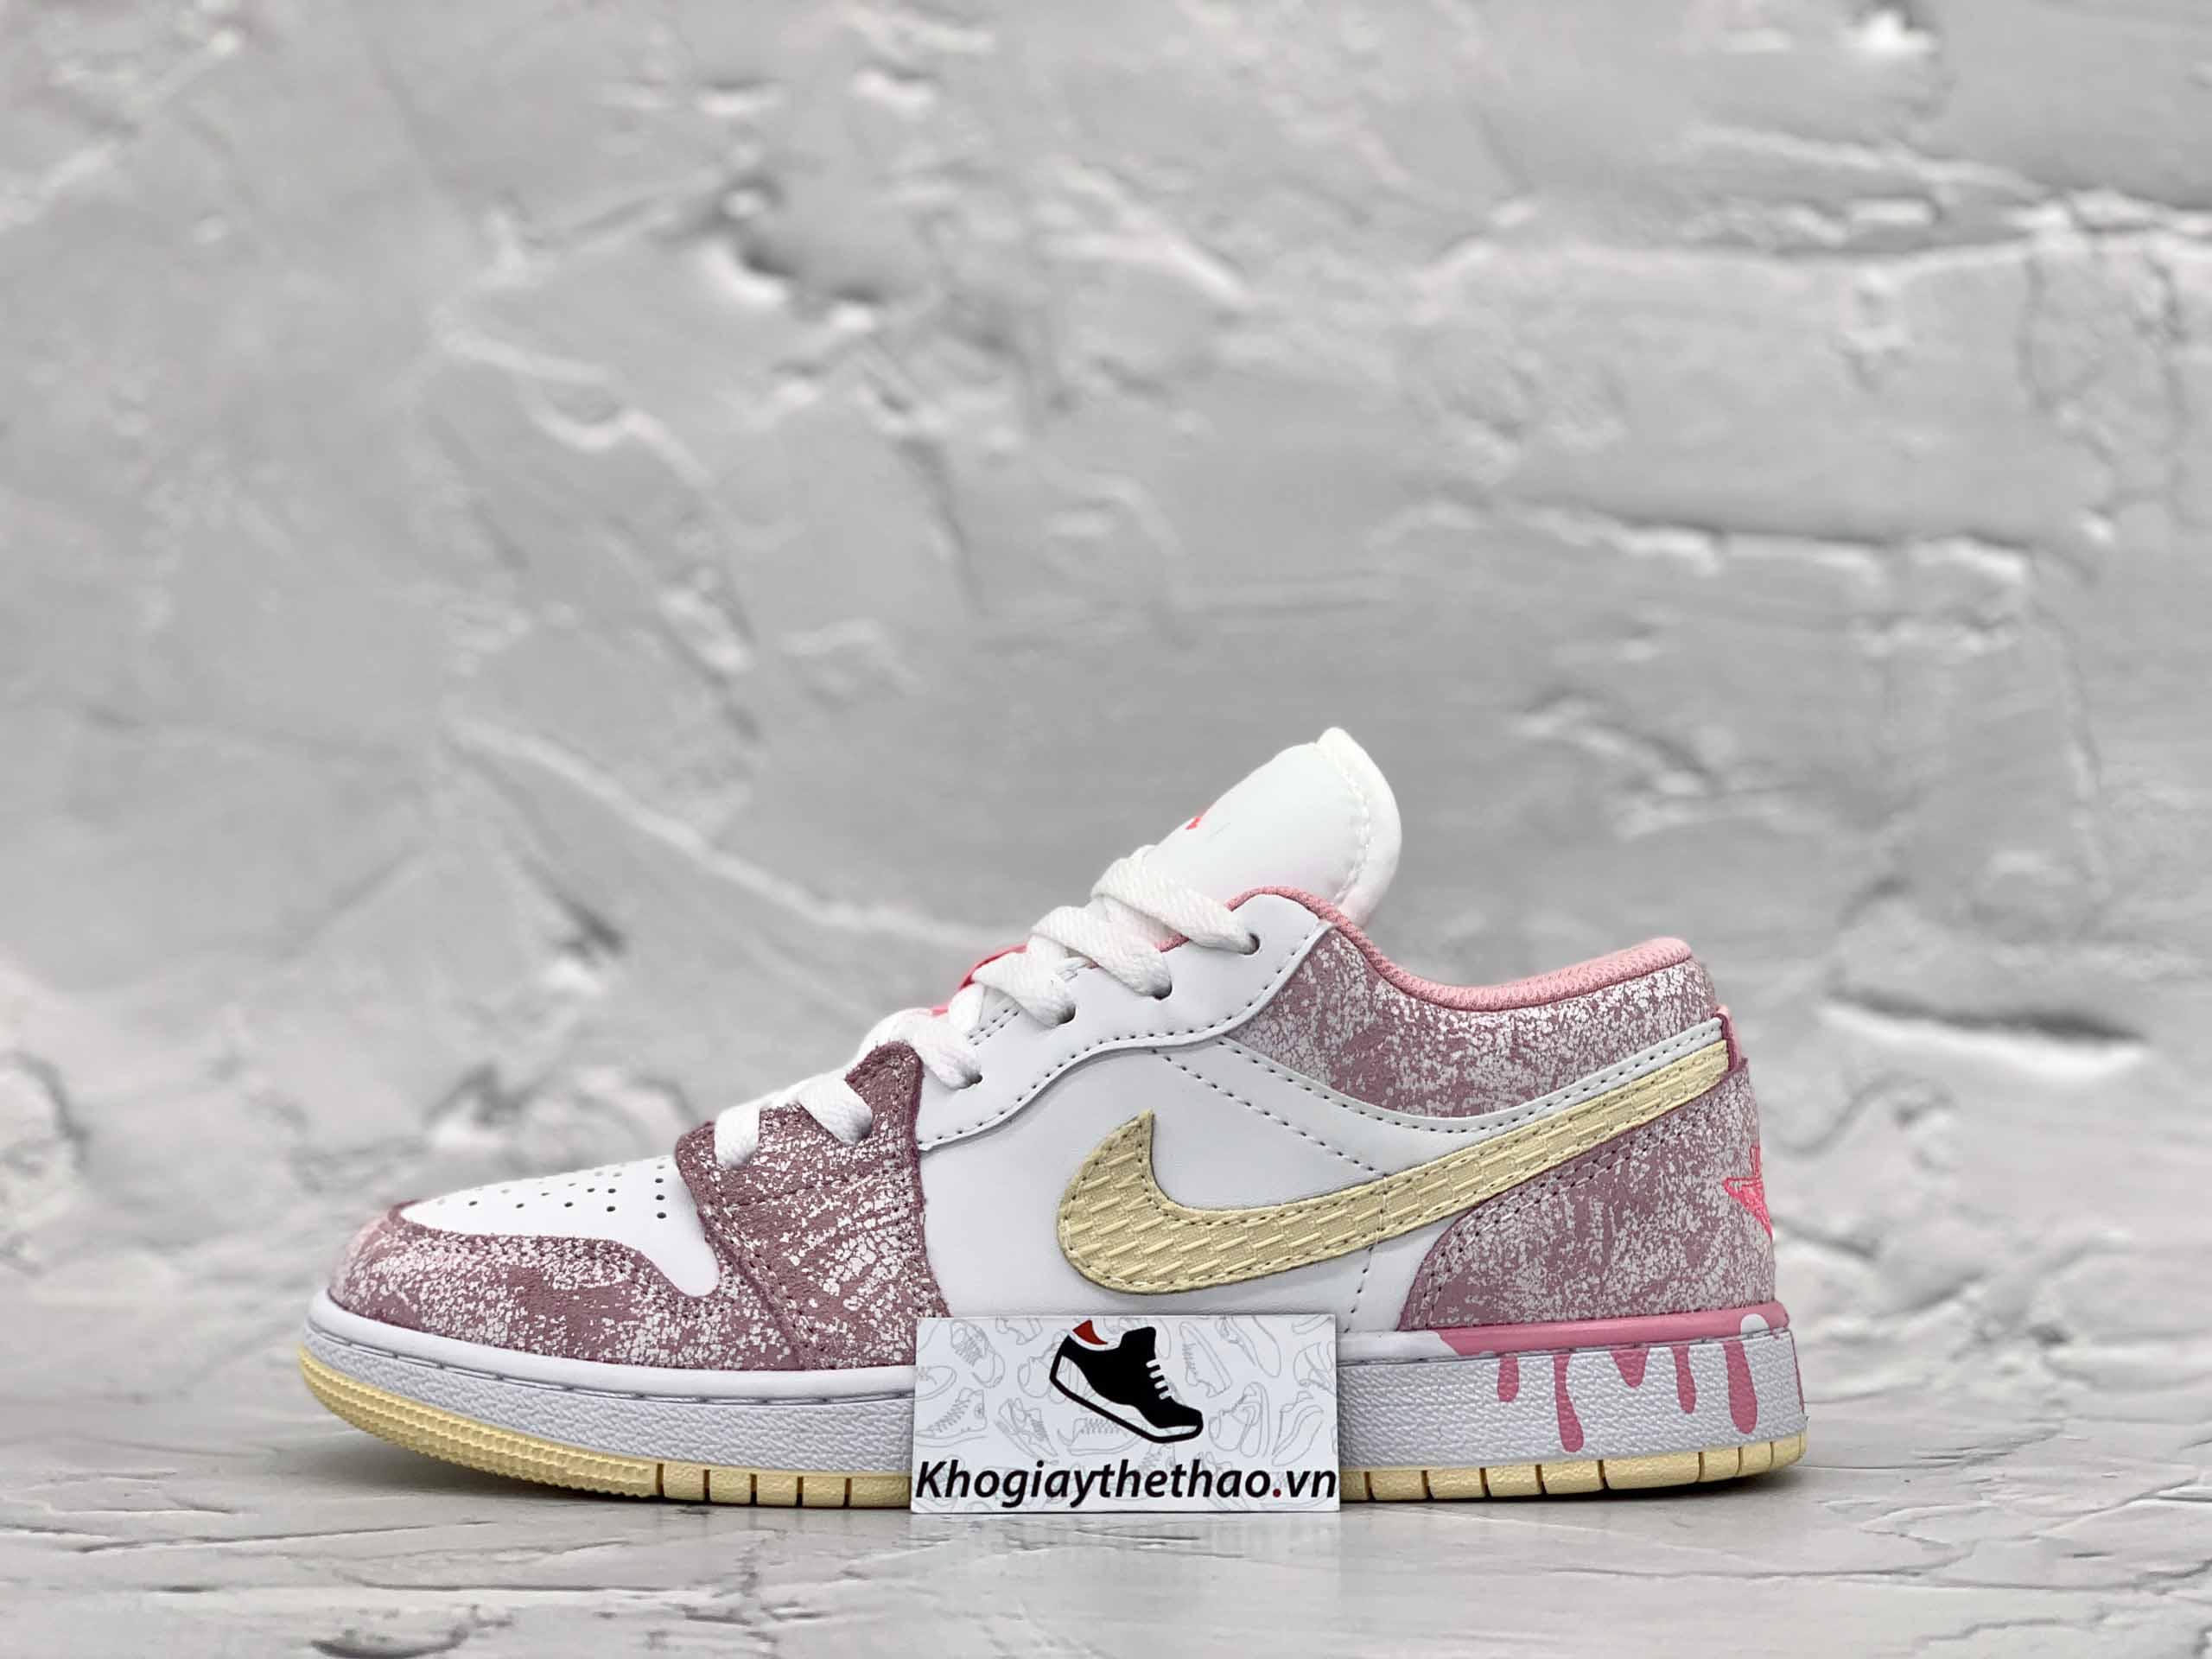 Giày Jordan 1 Low Paint Drip